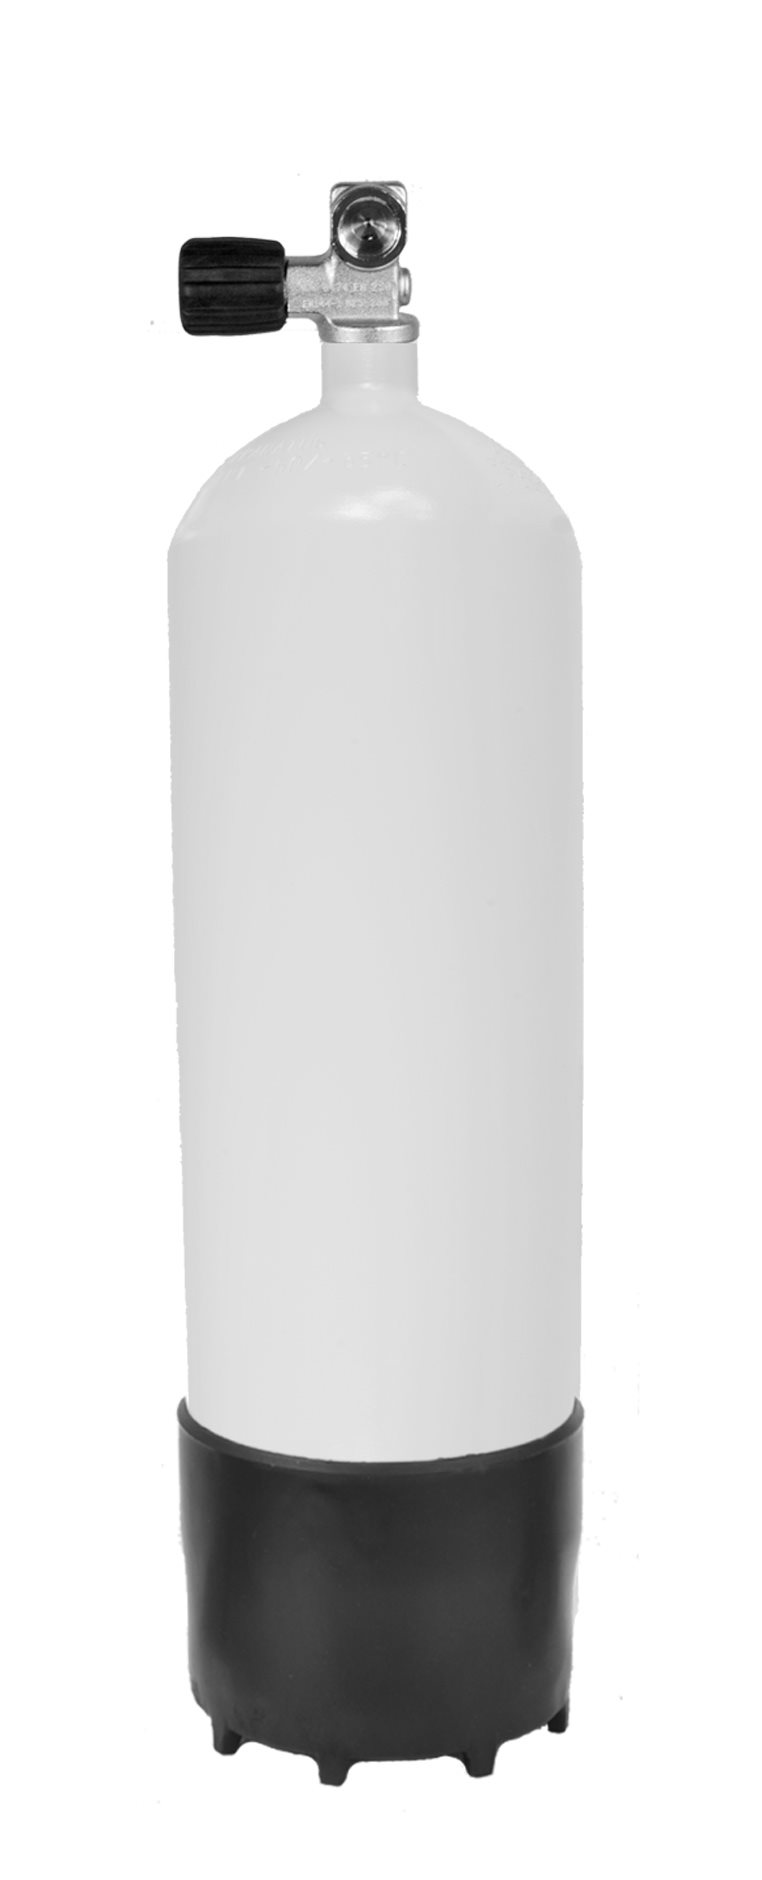 Водолазна бутилка 20 л / 232 бара - Eurocylinder